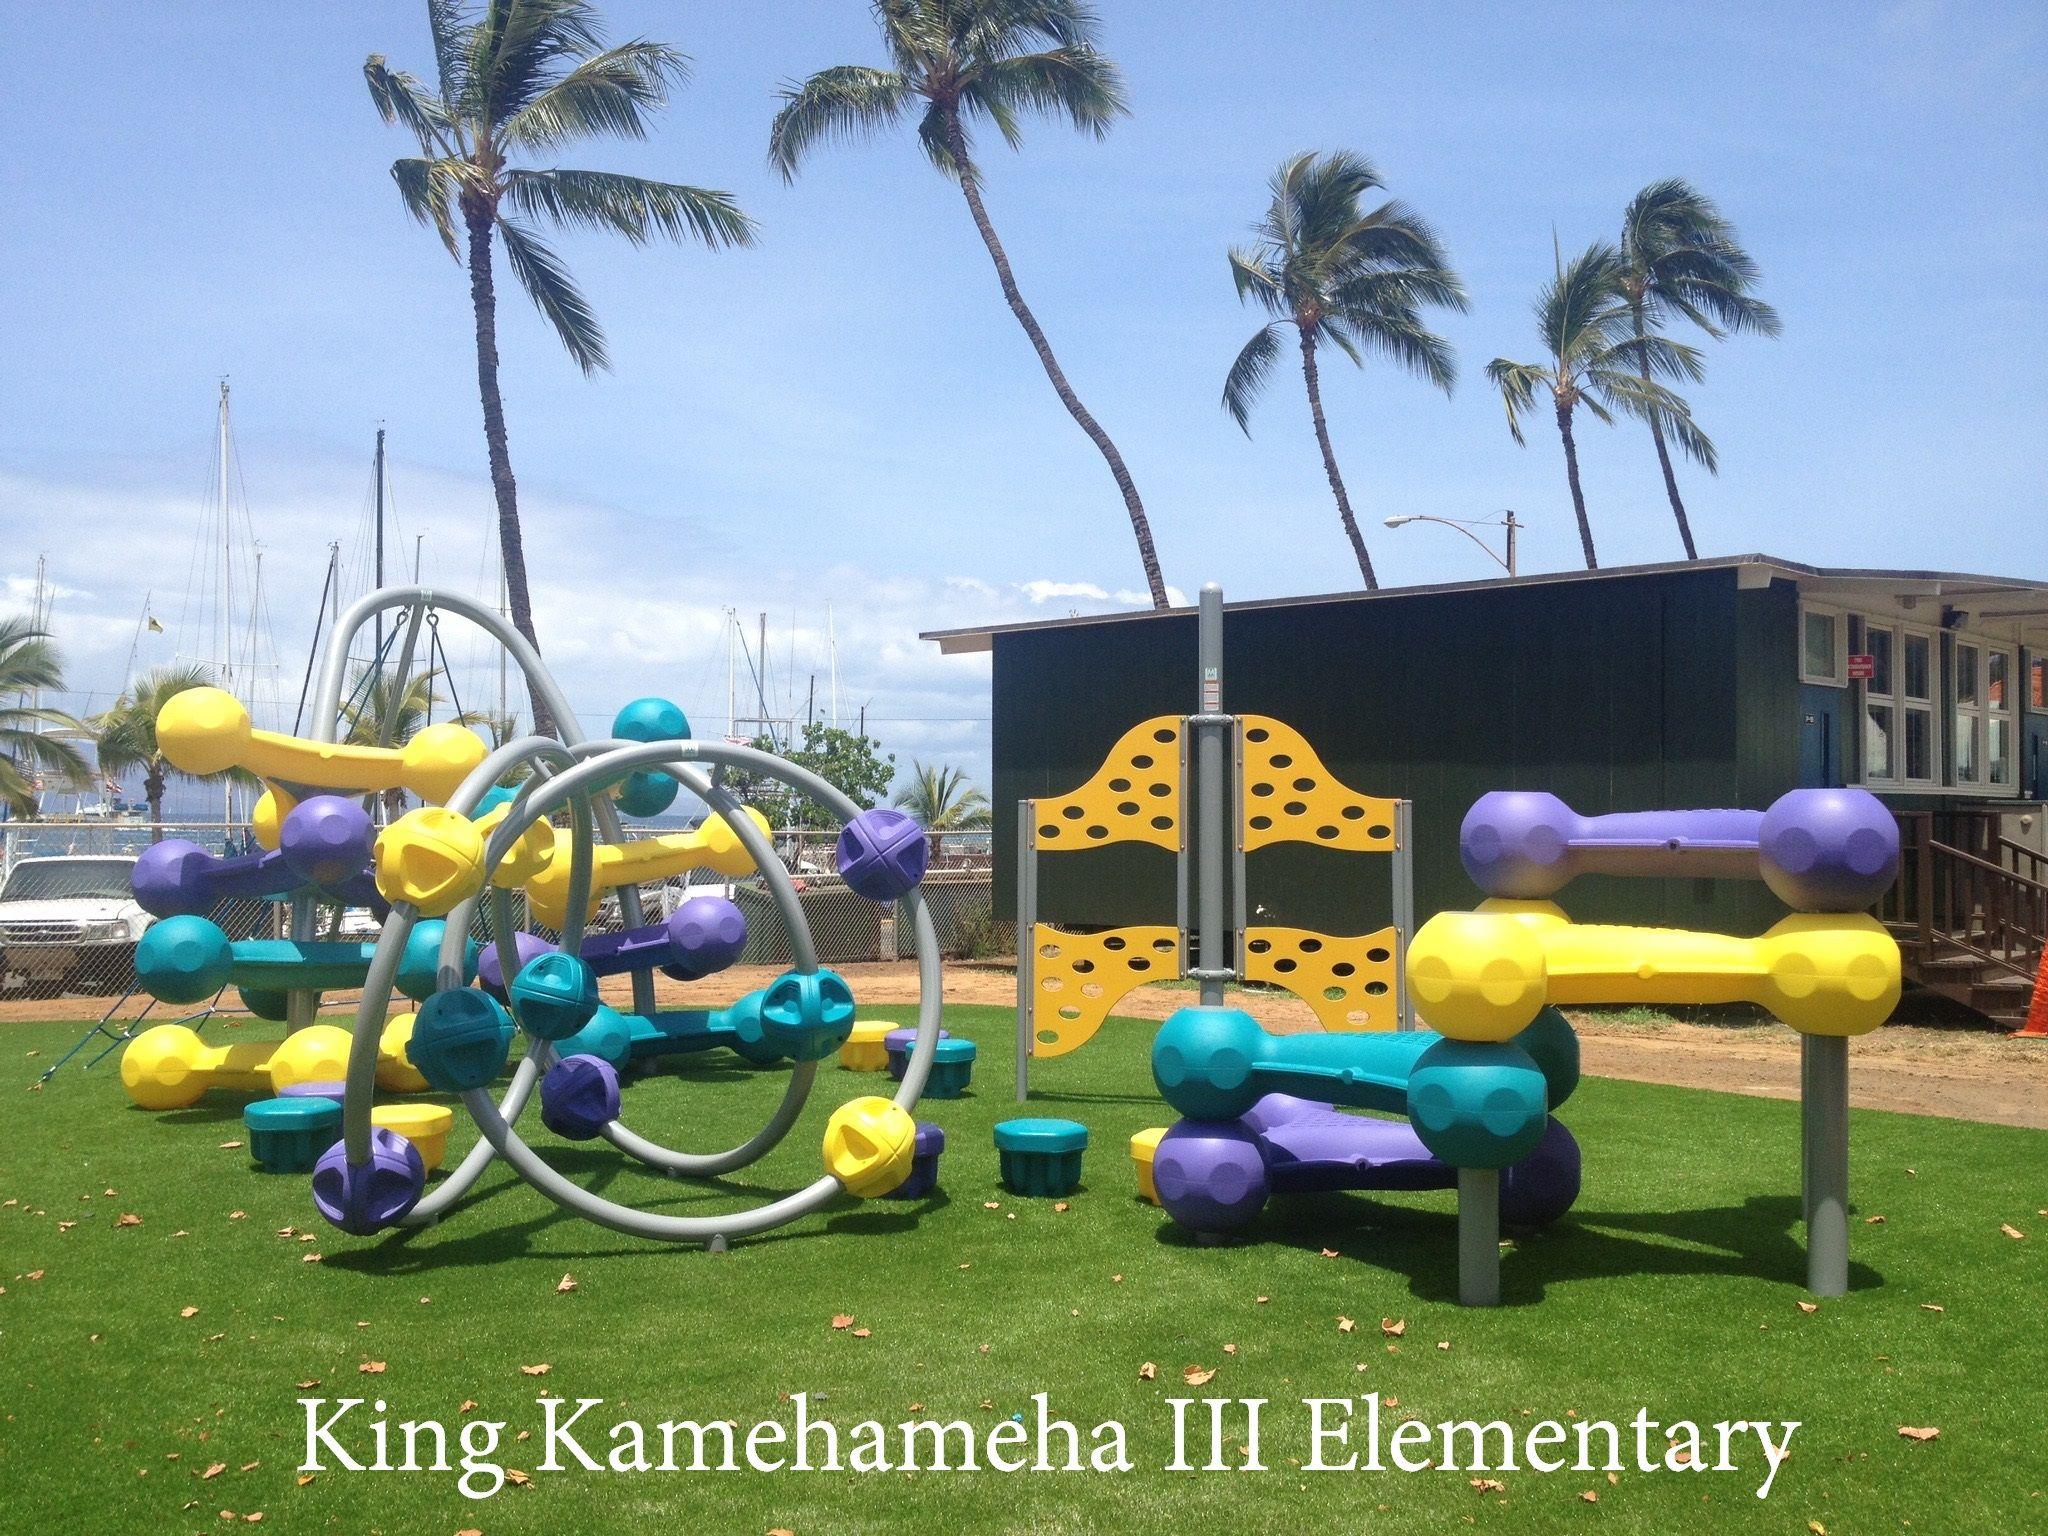 King Kamehameha Iii Elementary | King Kamehameha, Hawaii with King Kamehameha 3 School